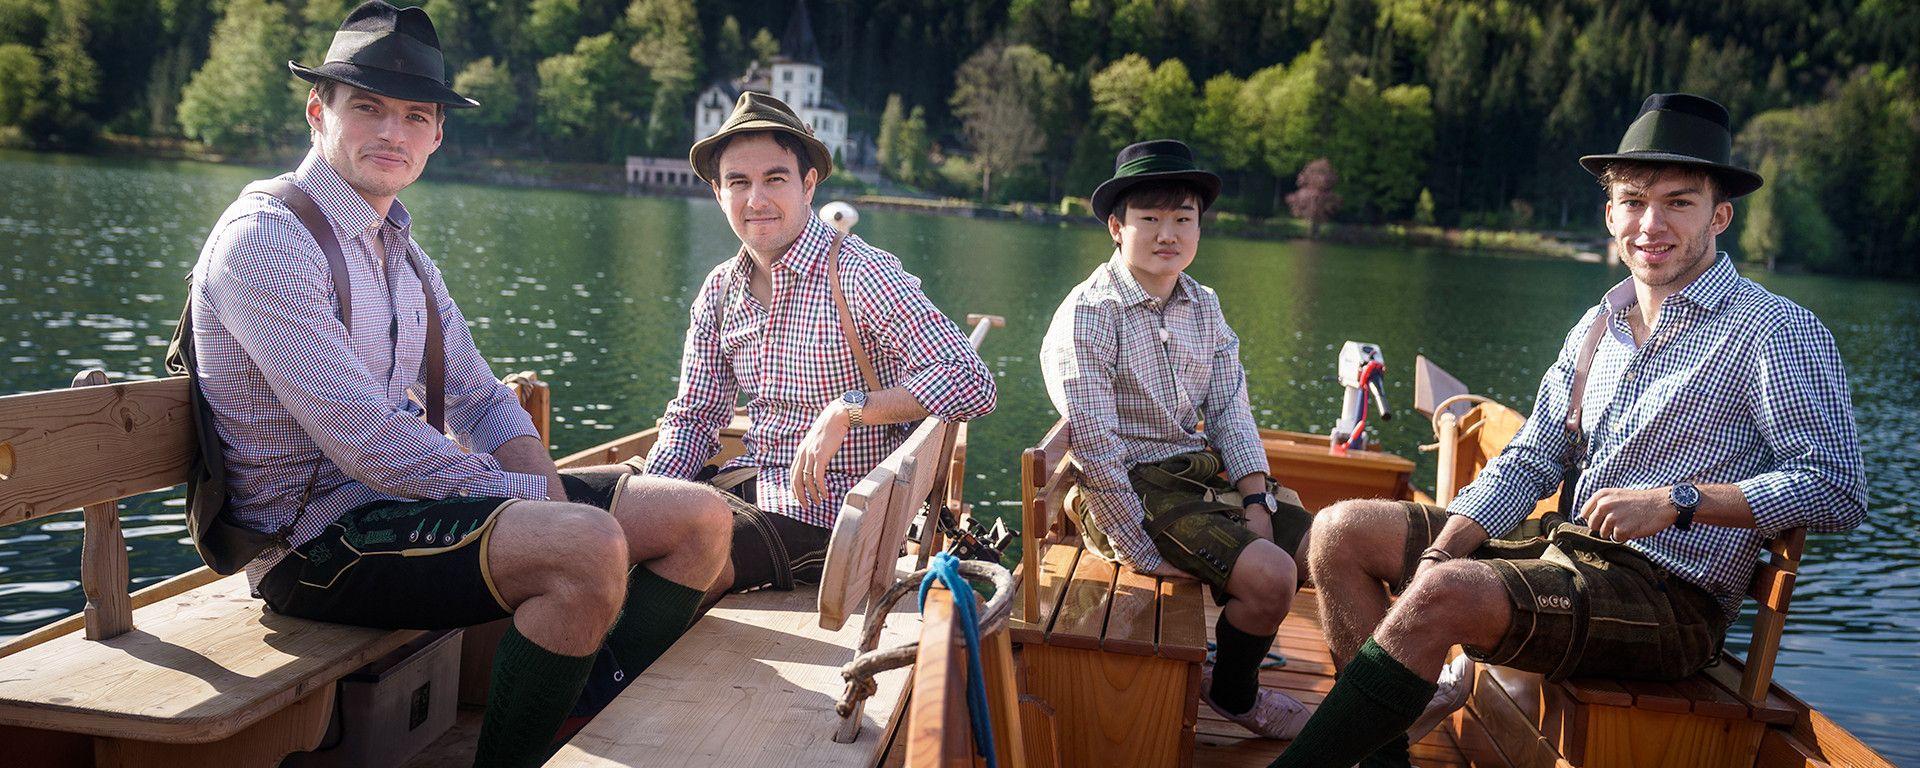 F1, GP Stiria 2021: benvenuti in Austria!